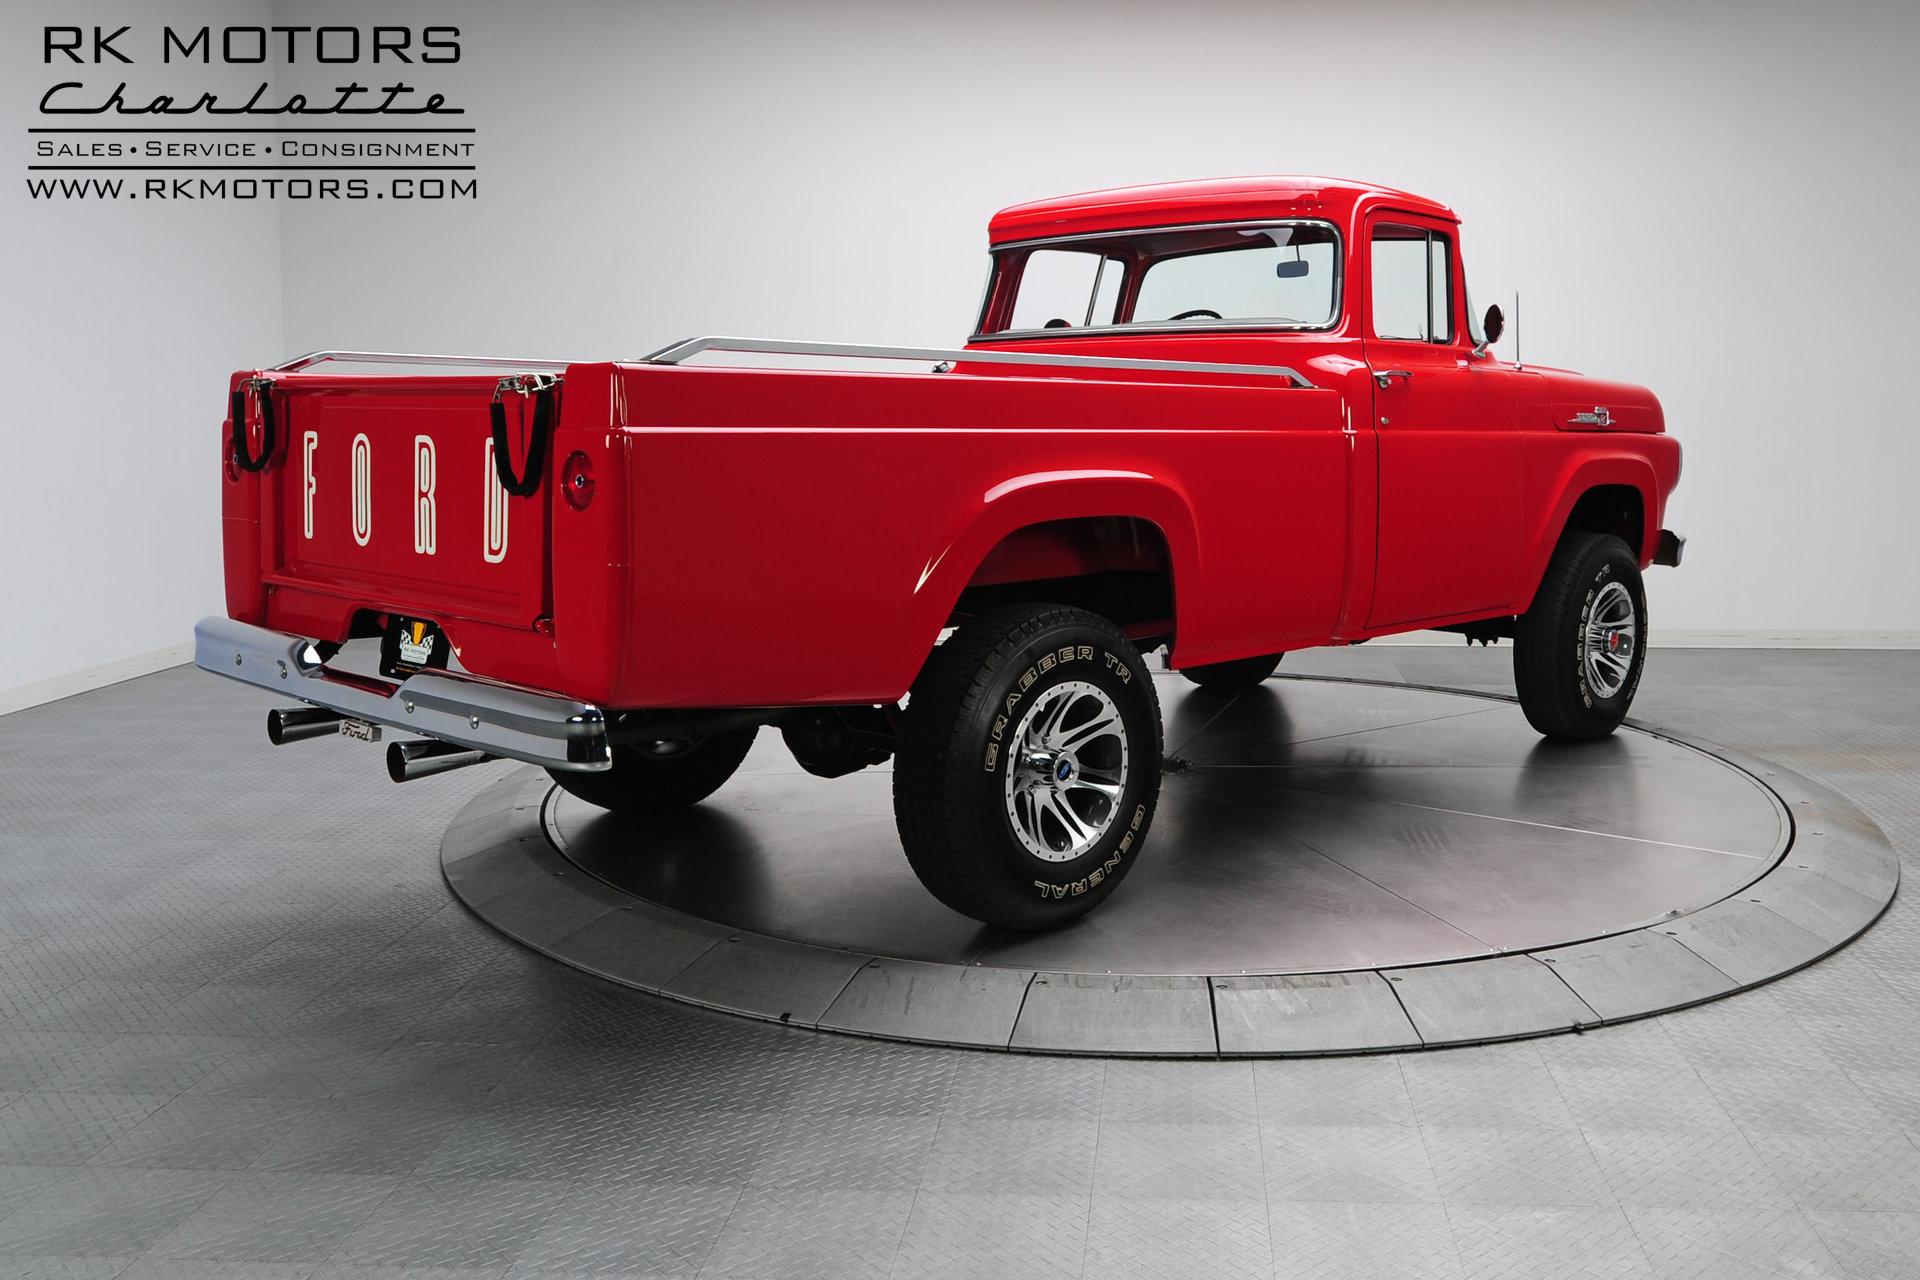 133083 1959 Ford F100 Rk Motors Classic Cars For Sale 1949 4x4 Pickup Trucks